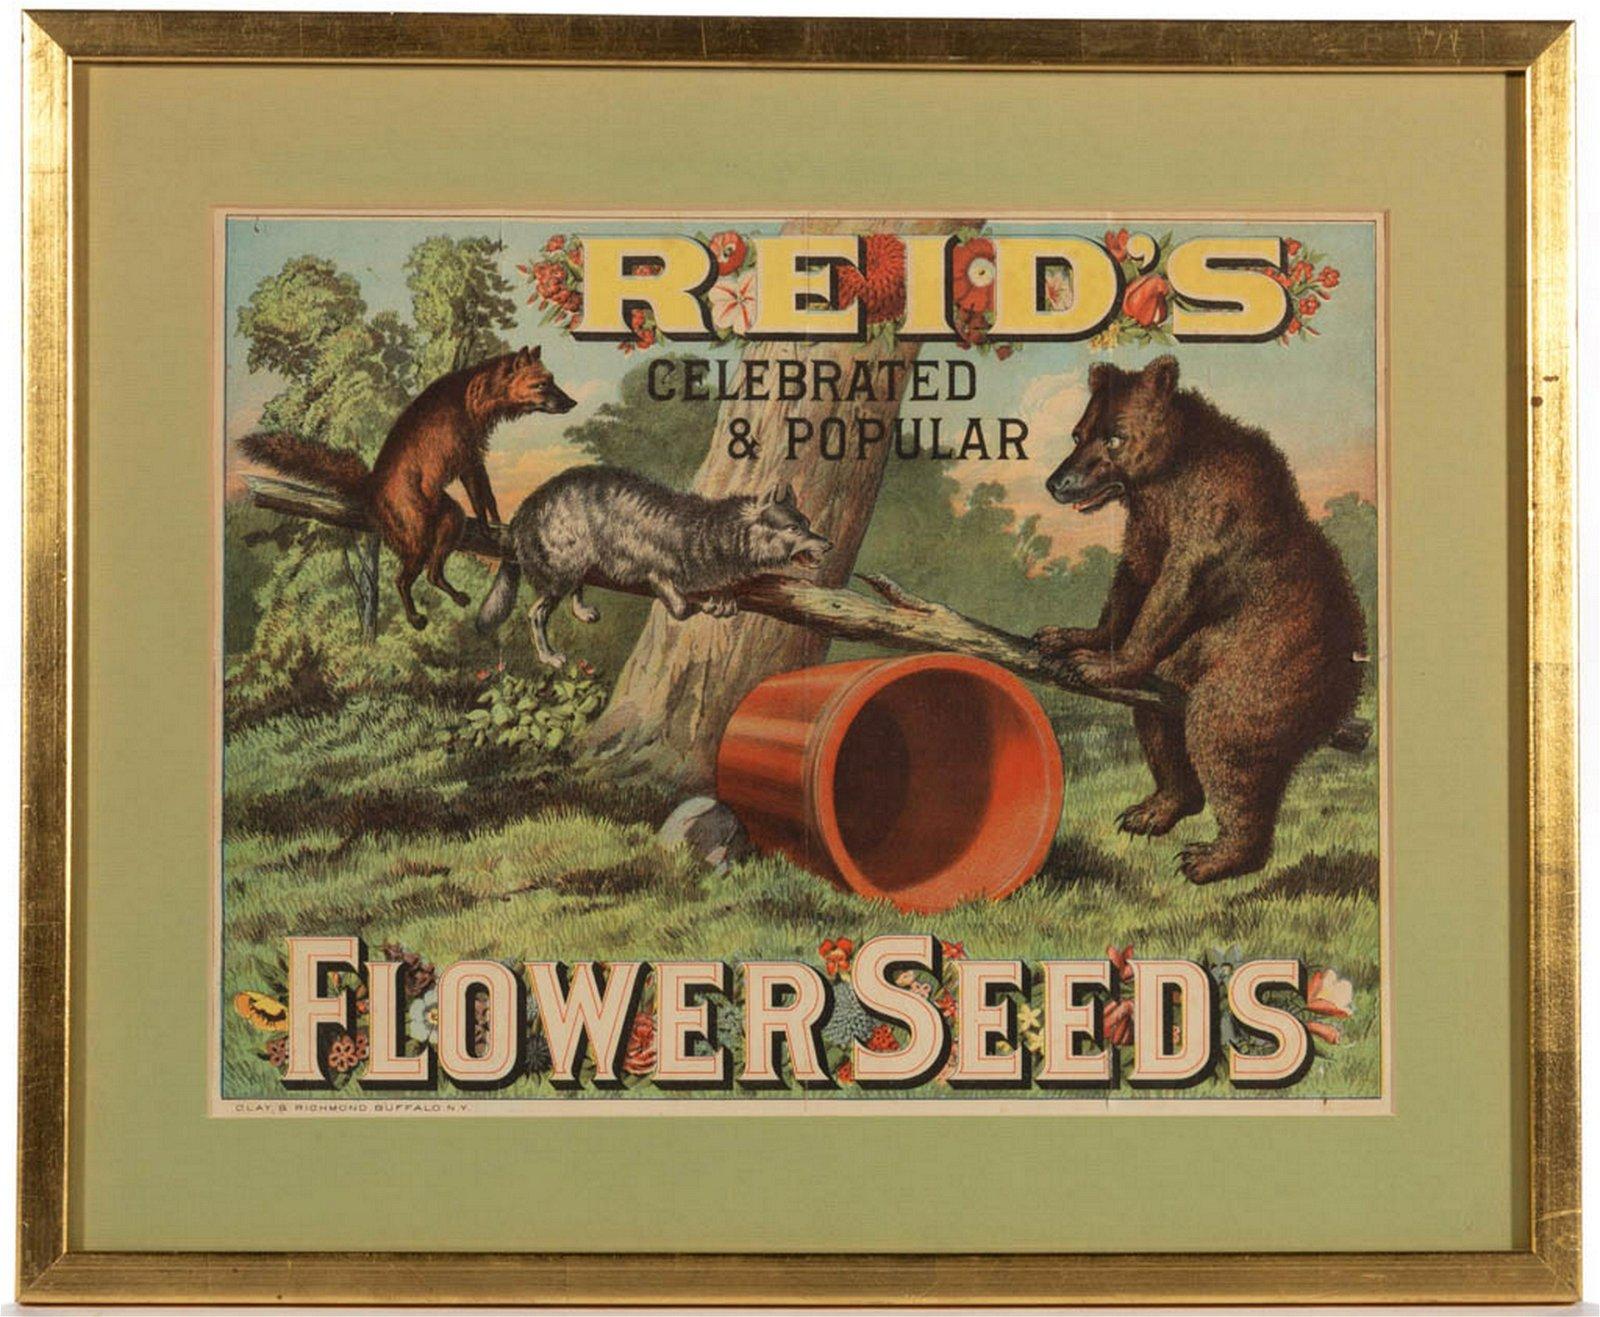 REID'S CELEBRATED AND POPULAR FLOWER SEEDS ADVERTISING